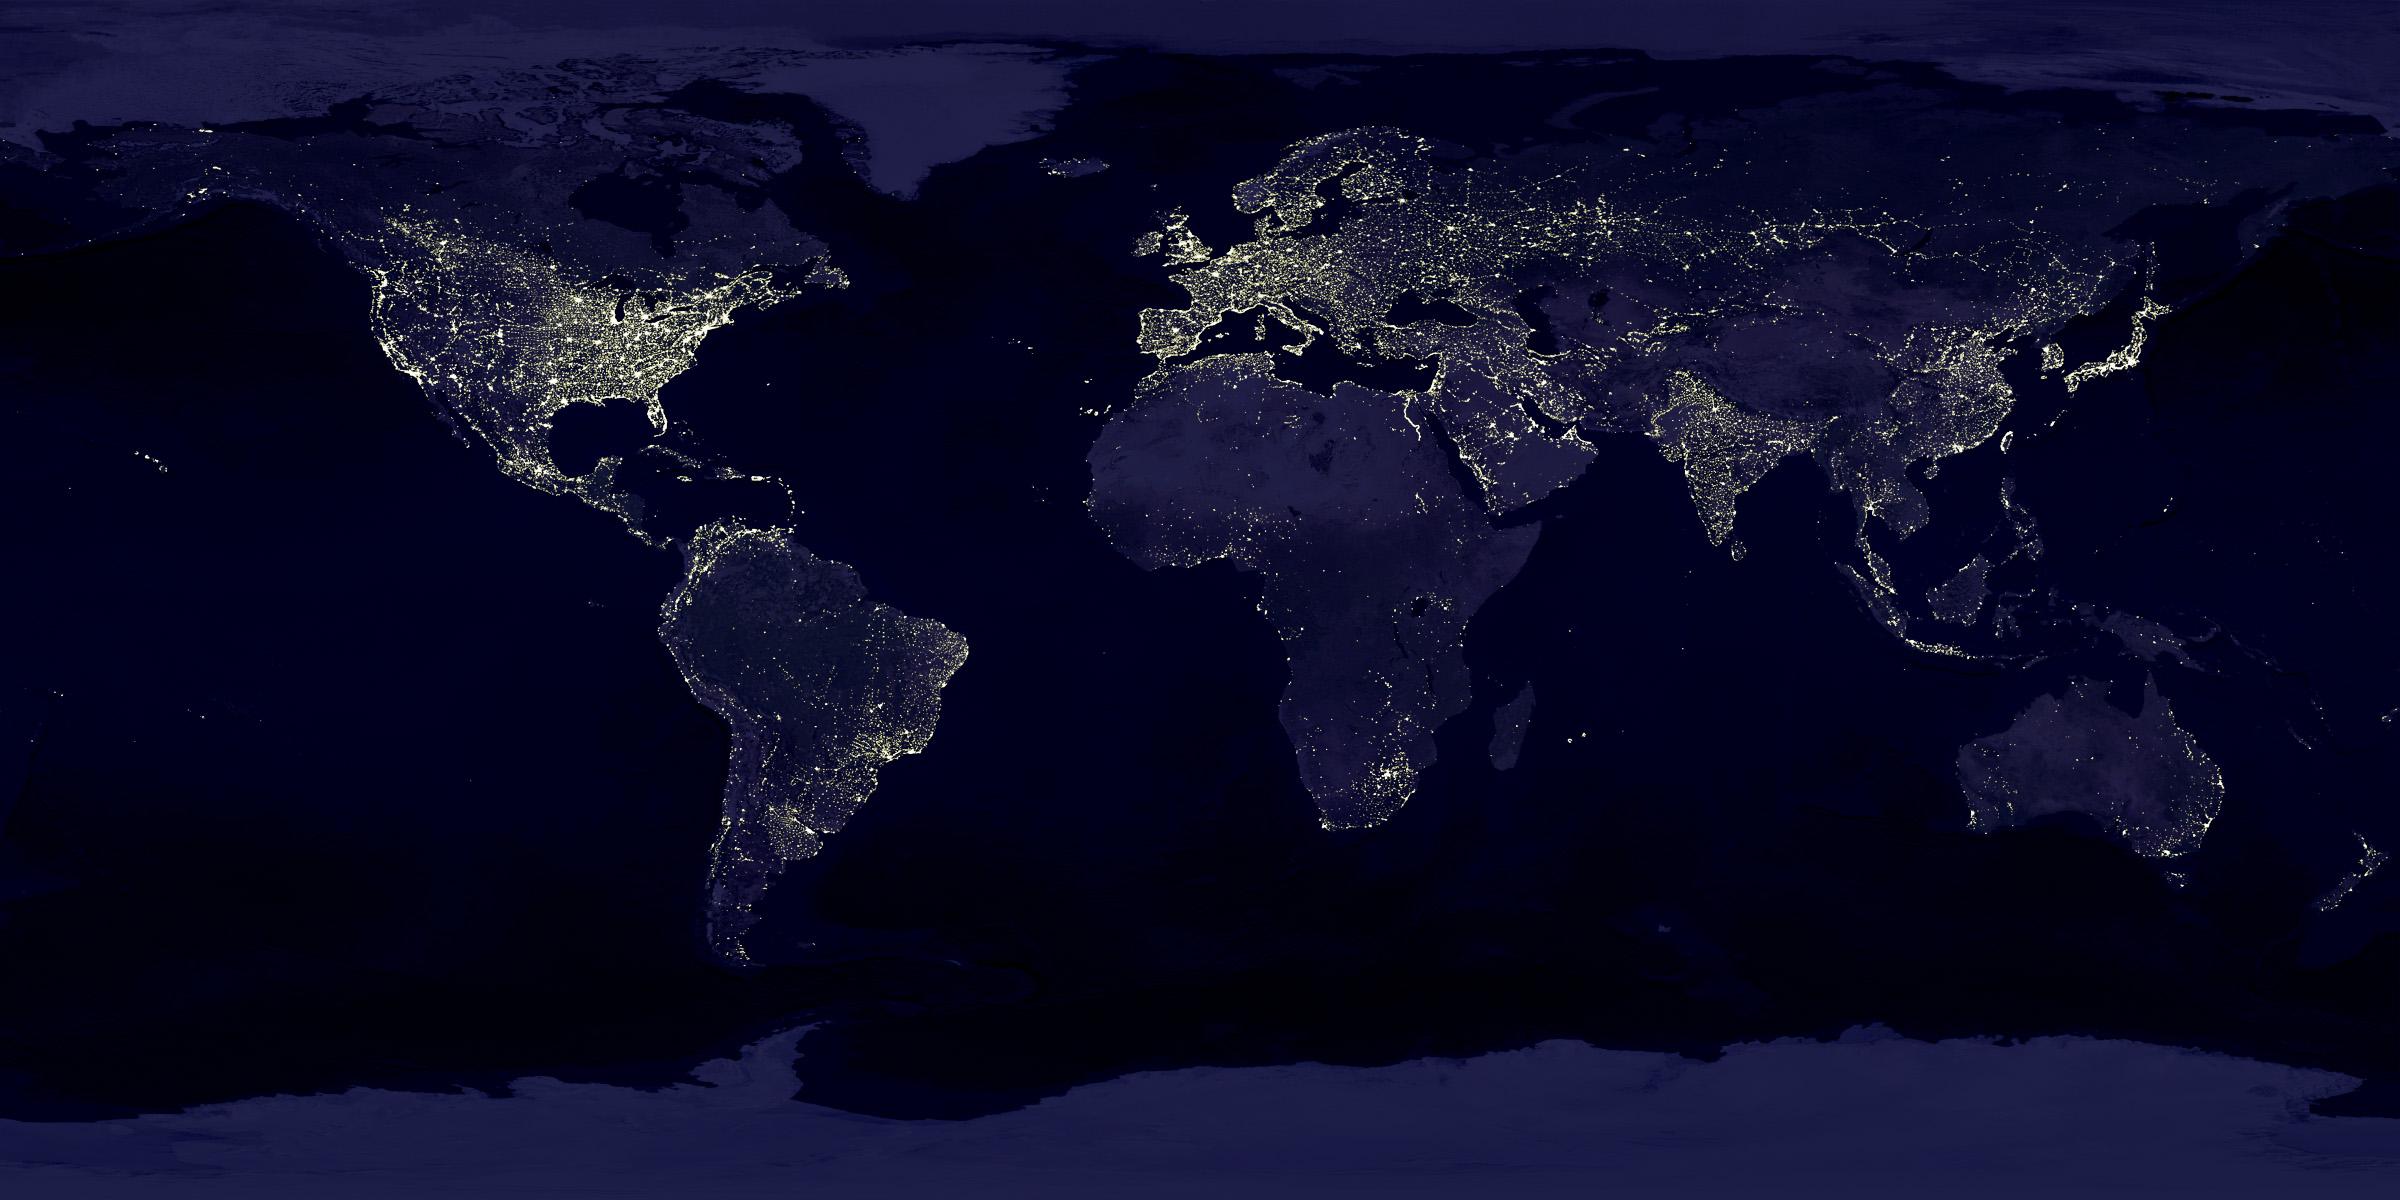 earth_lights_lrg